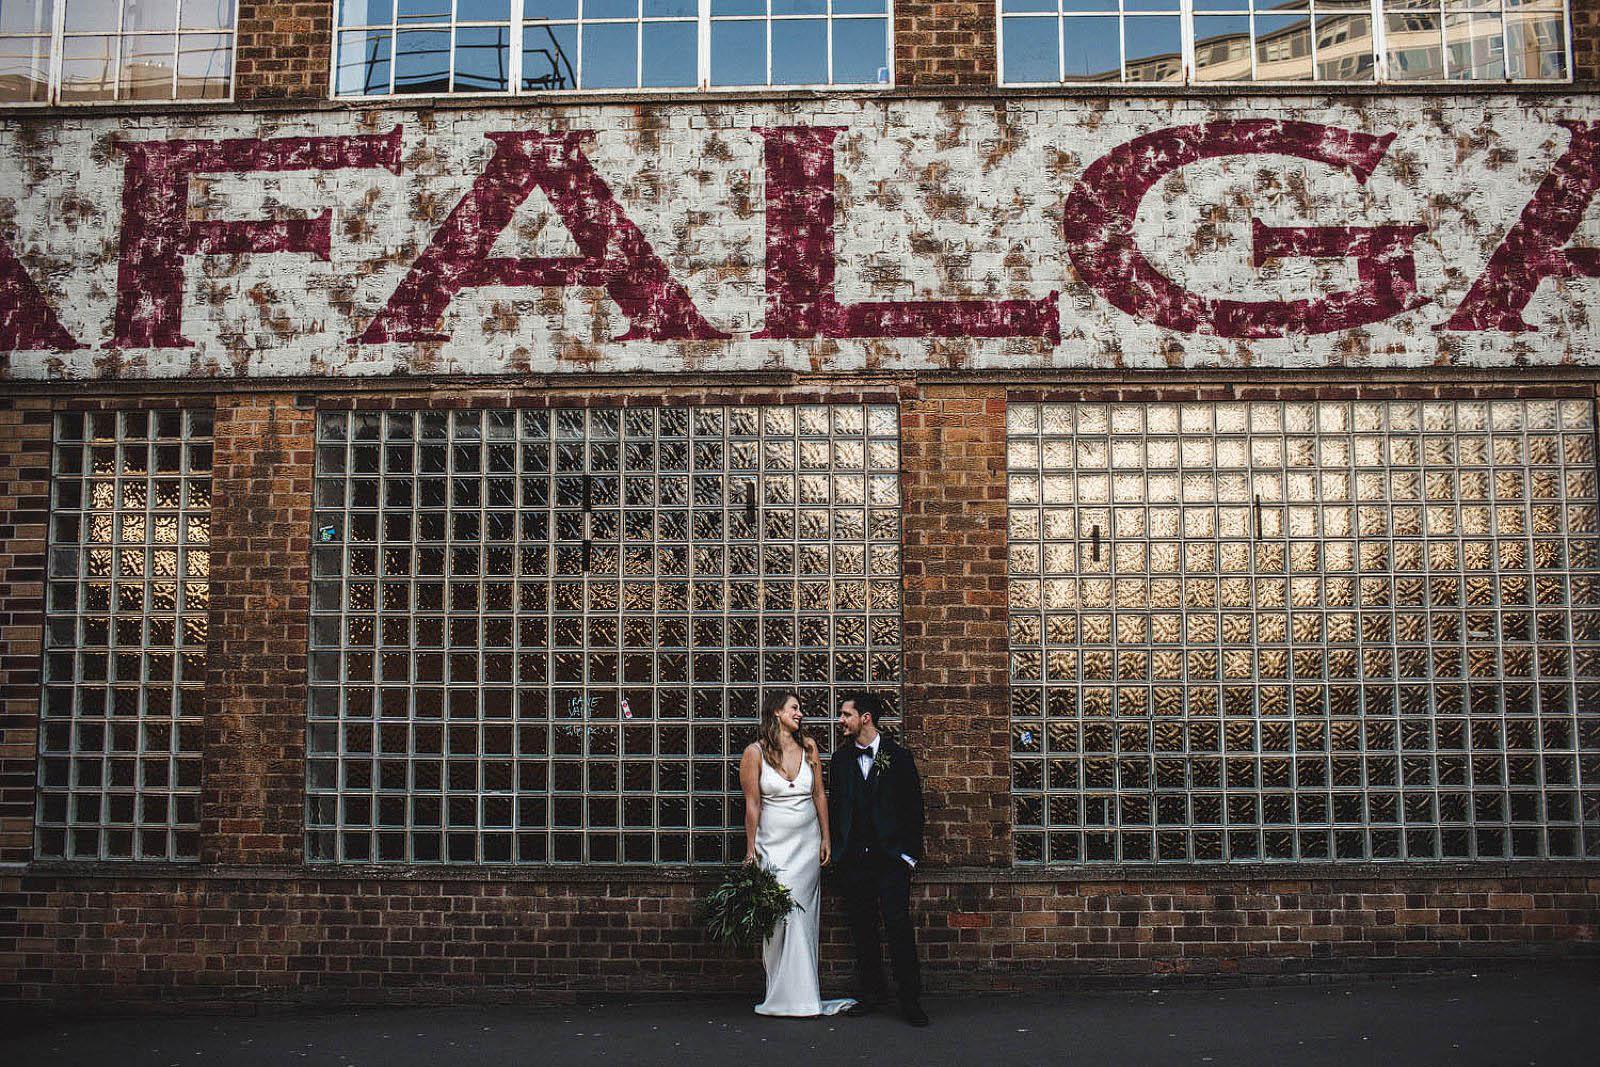 Trafalgar warehouse wedding